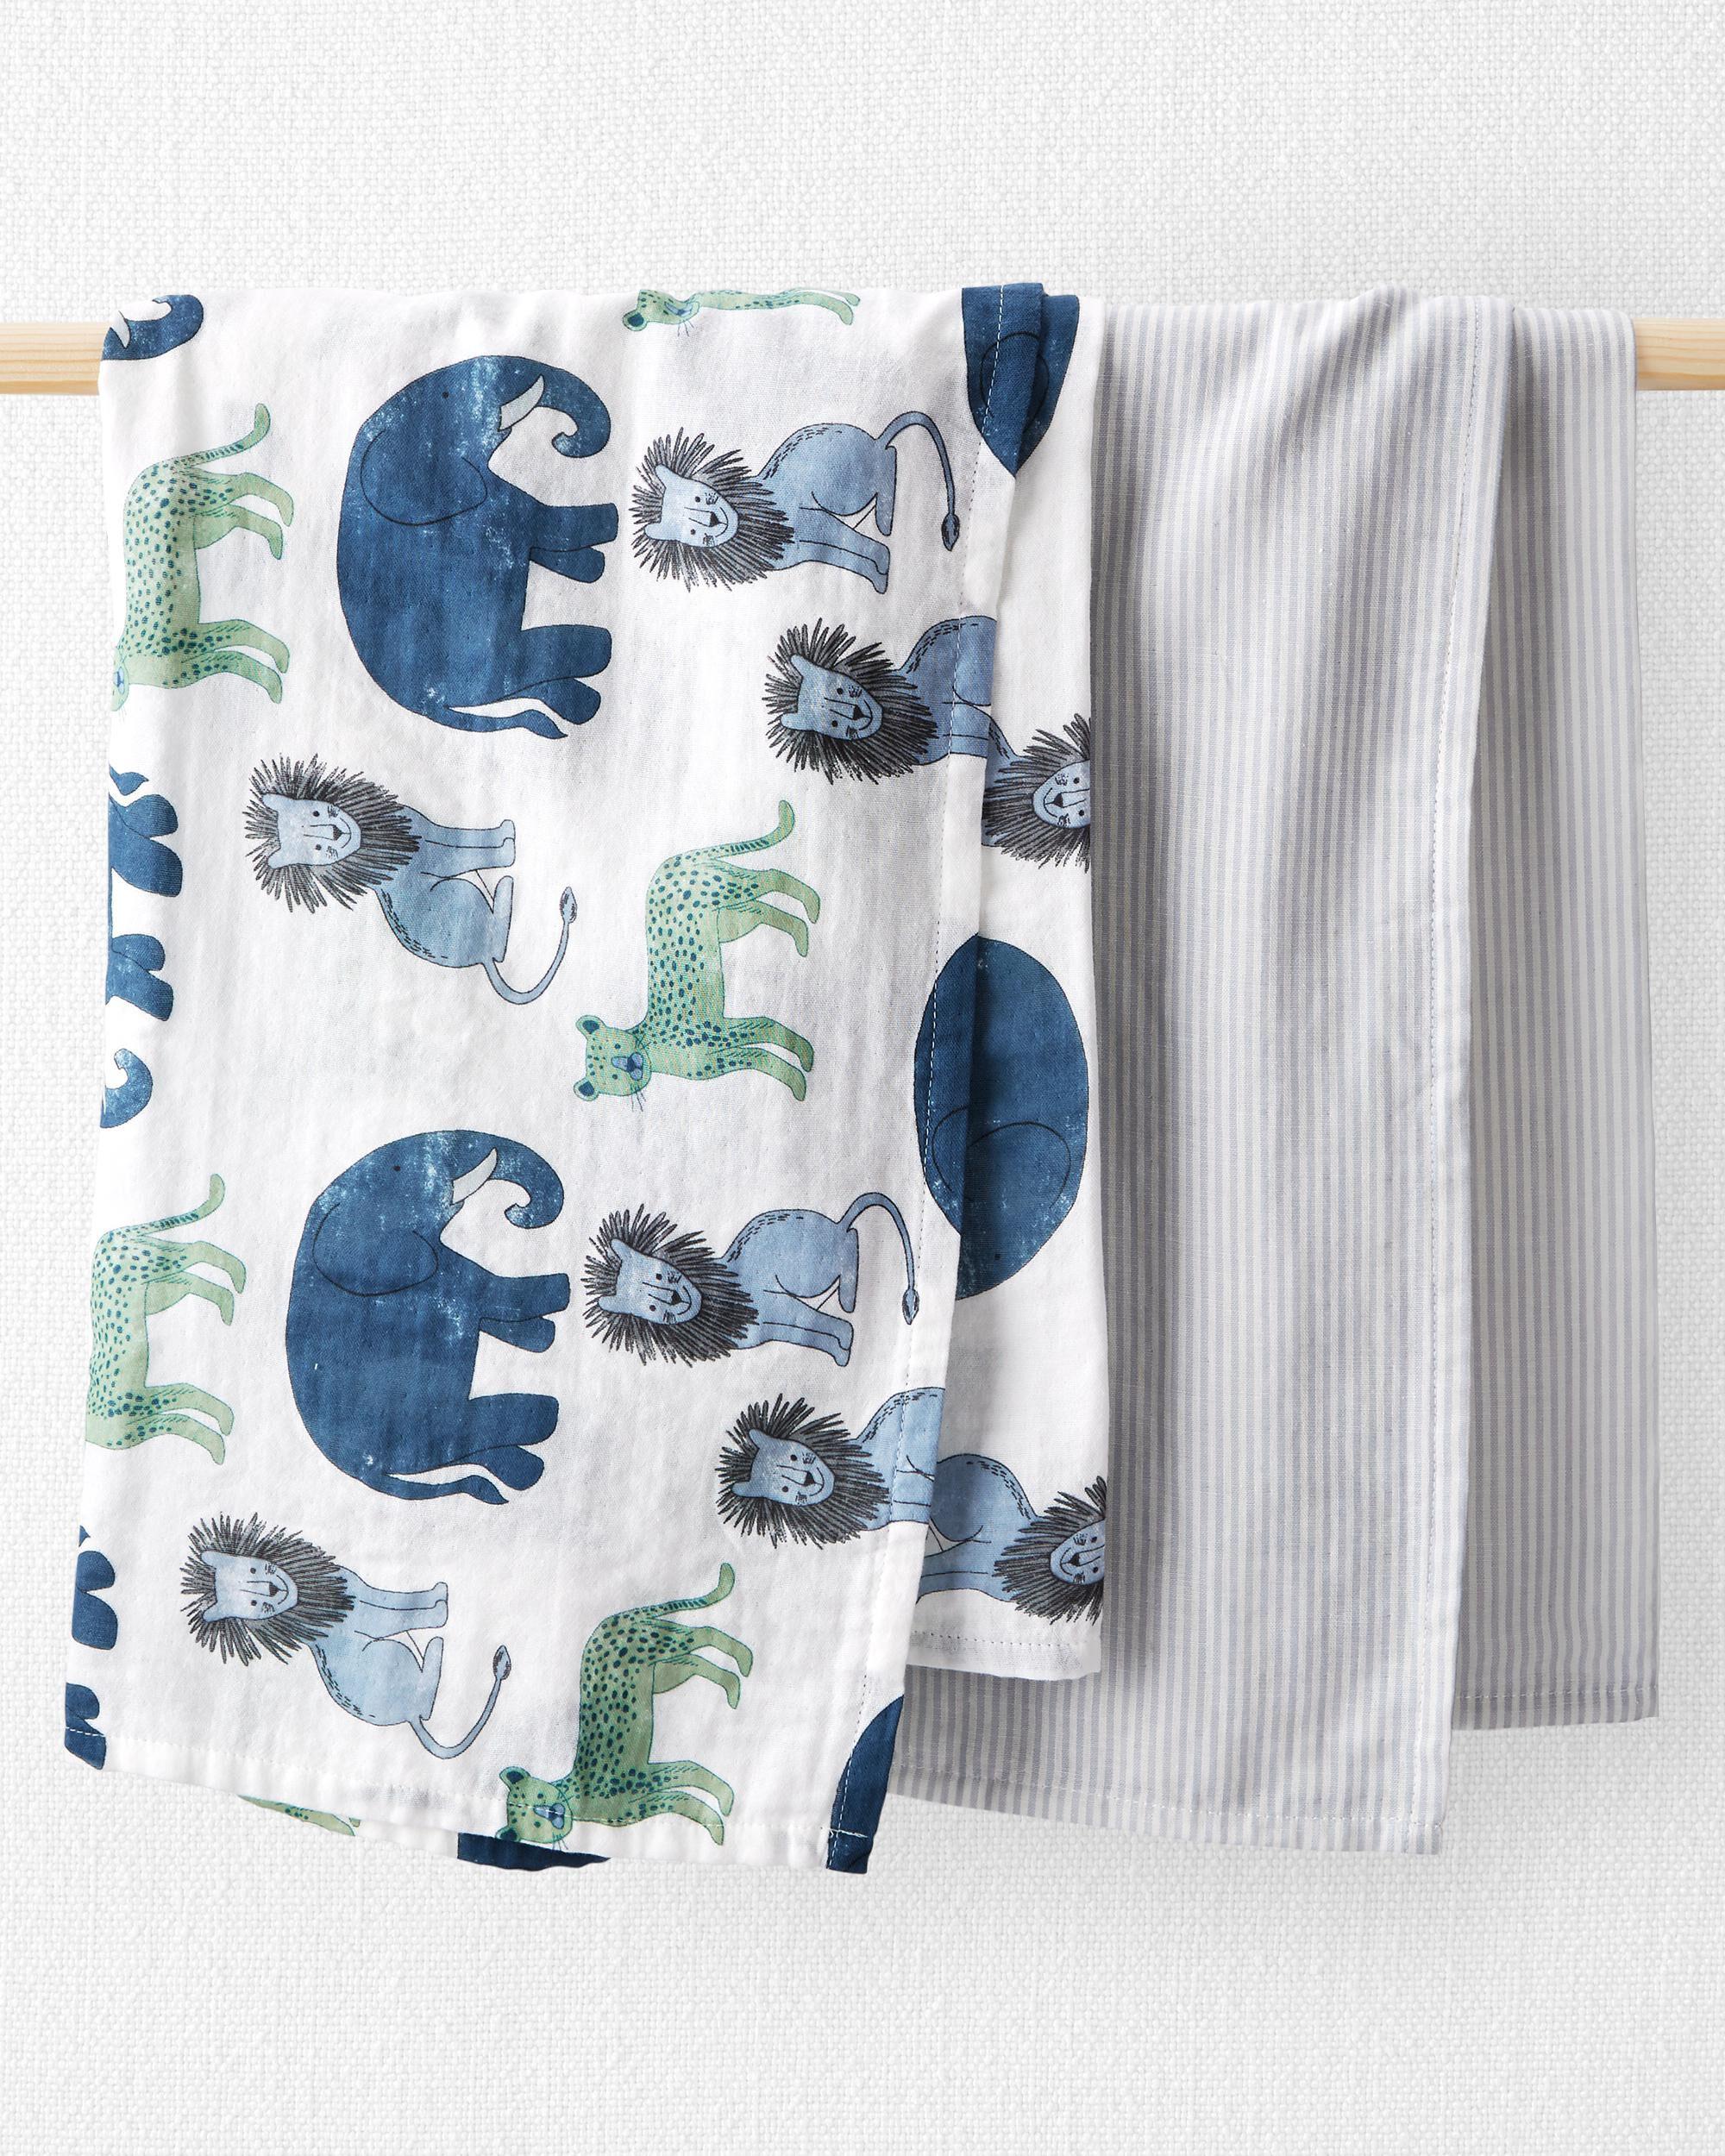 Oshkoshbgosh 2-Pack Cotton Muslin Swaddle Blankets